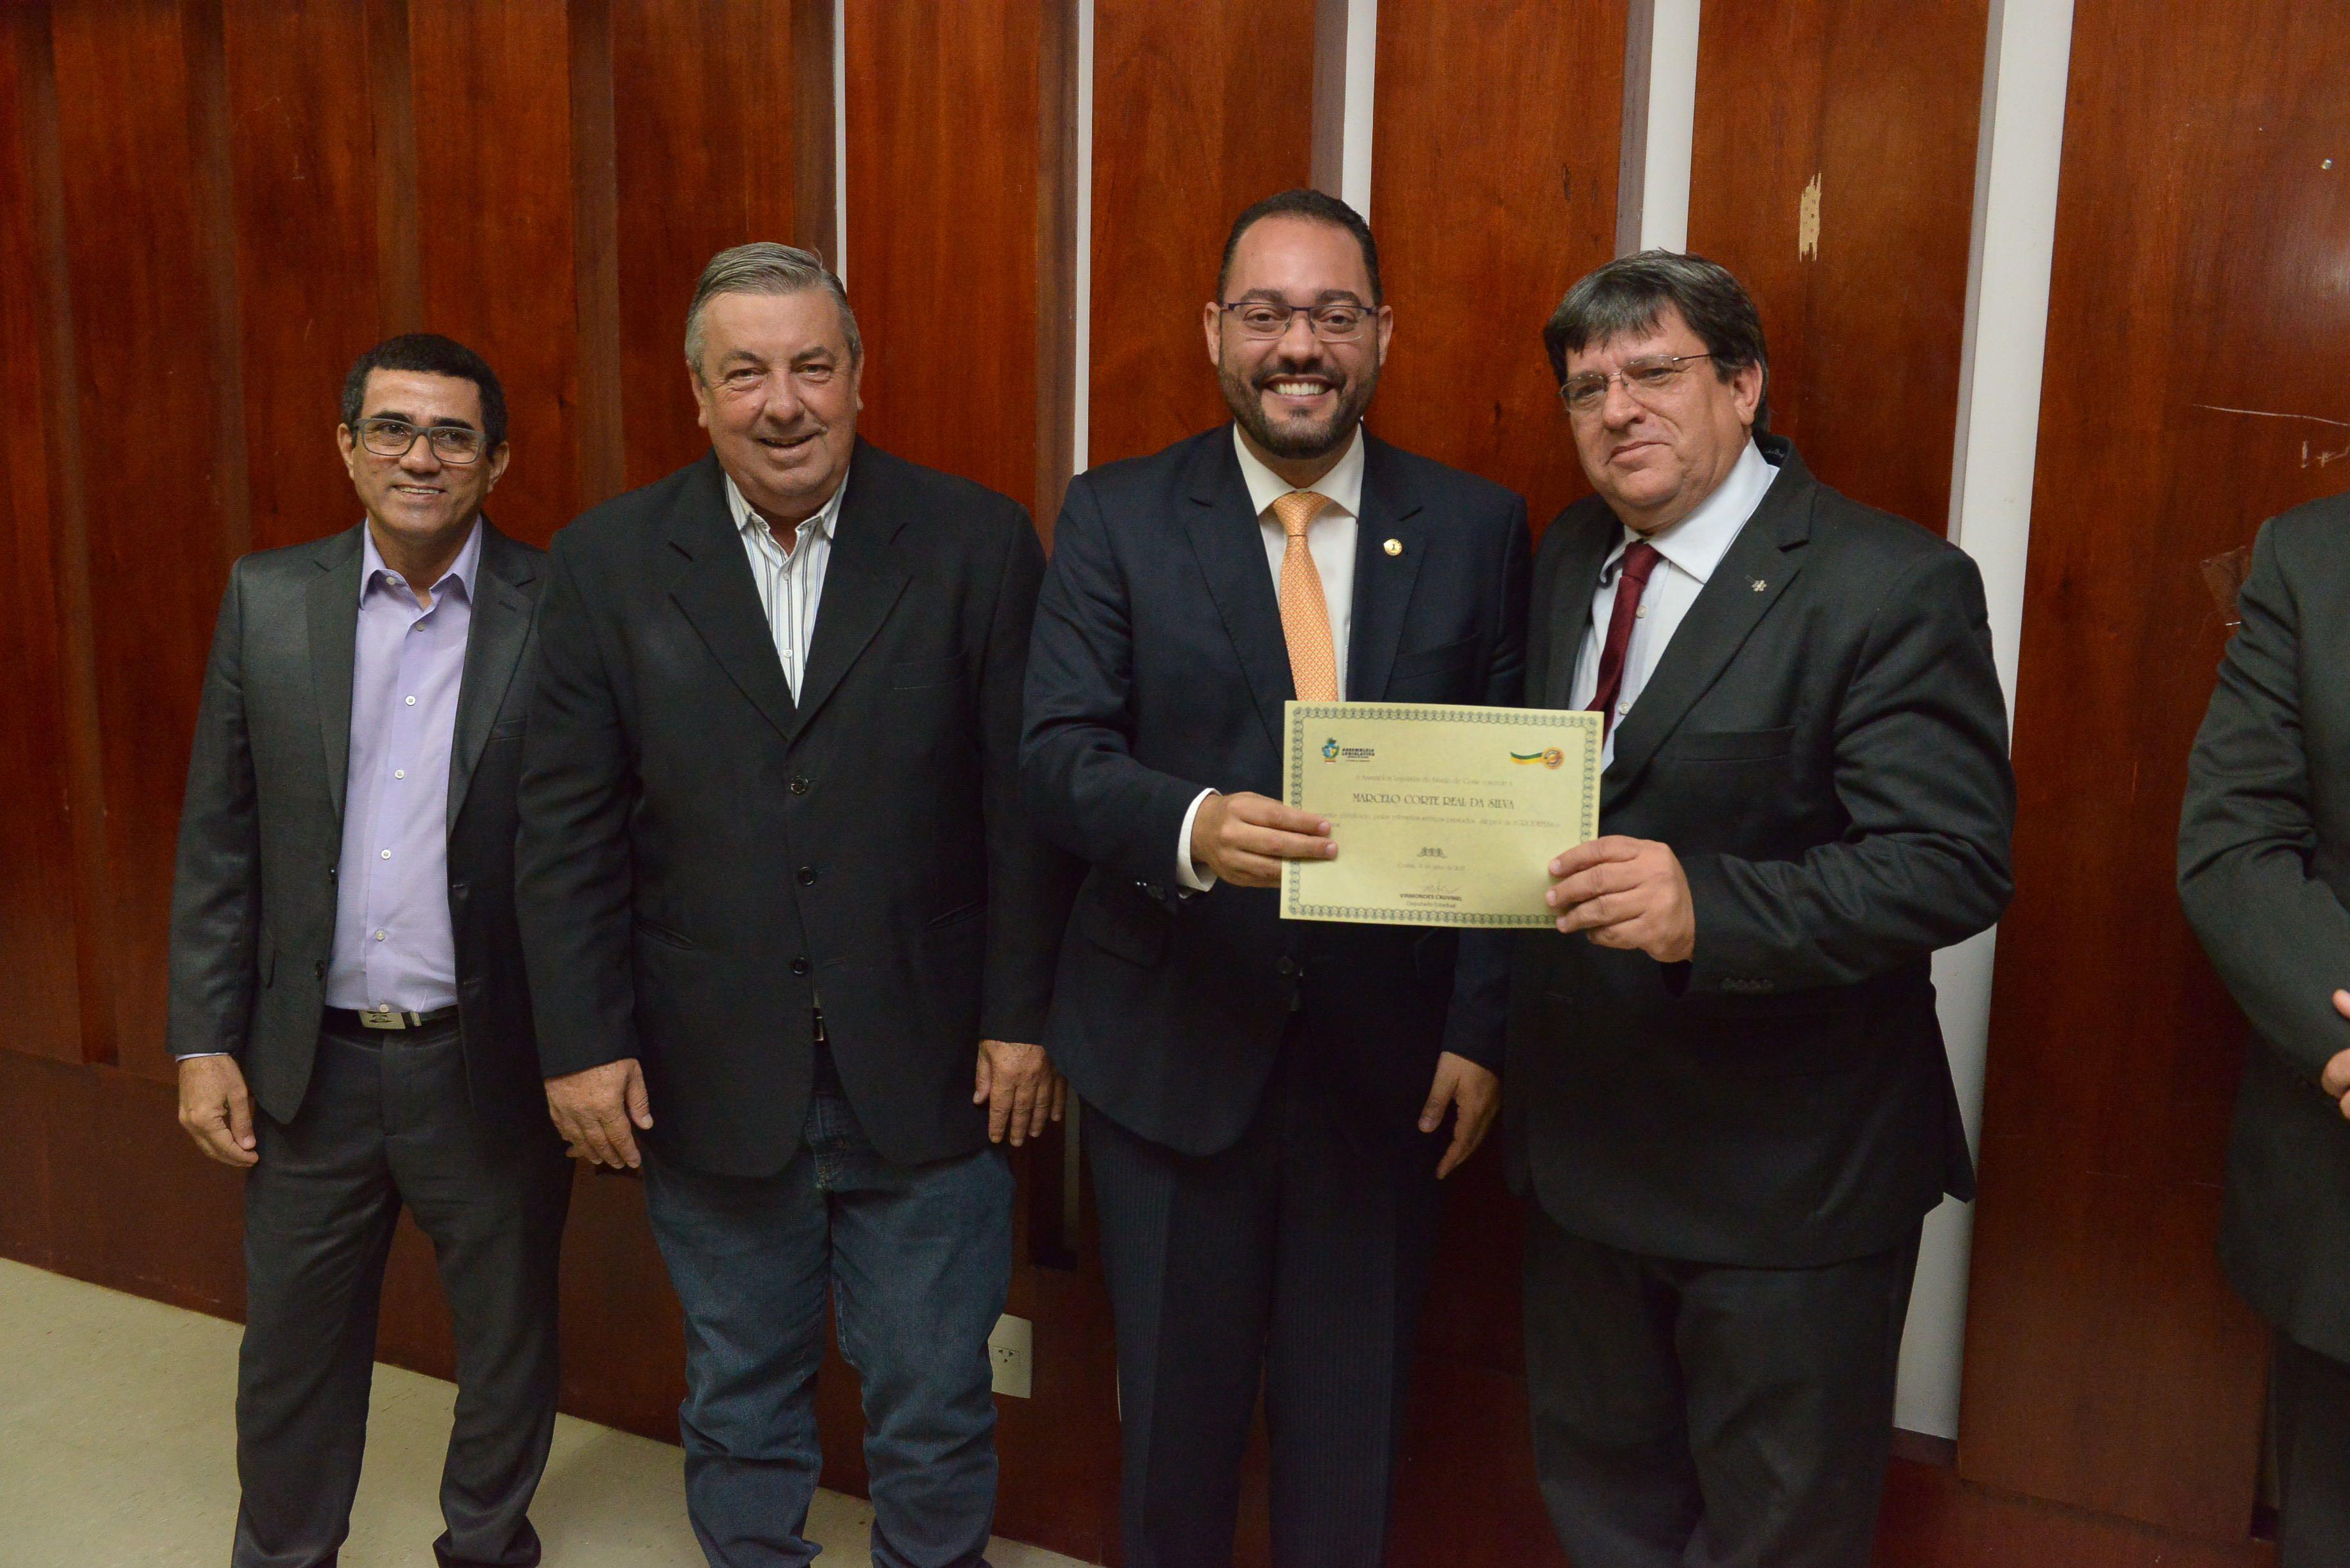 Na Assembleia Legislativa de Goiás, presidente do SINFEAGO recebe homenagem